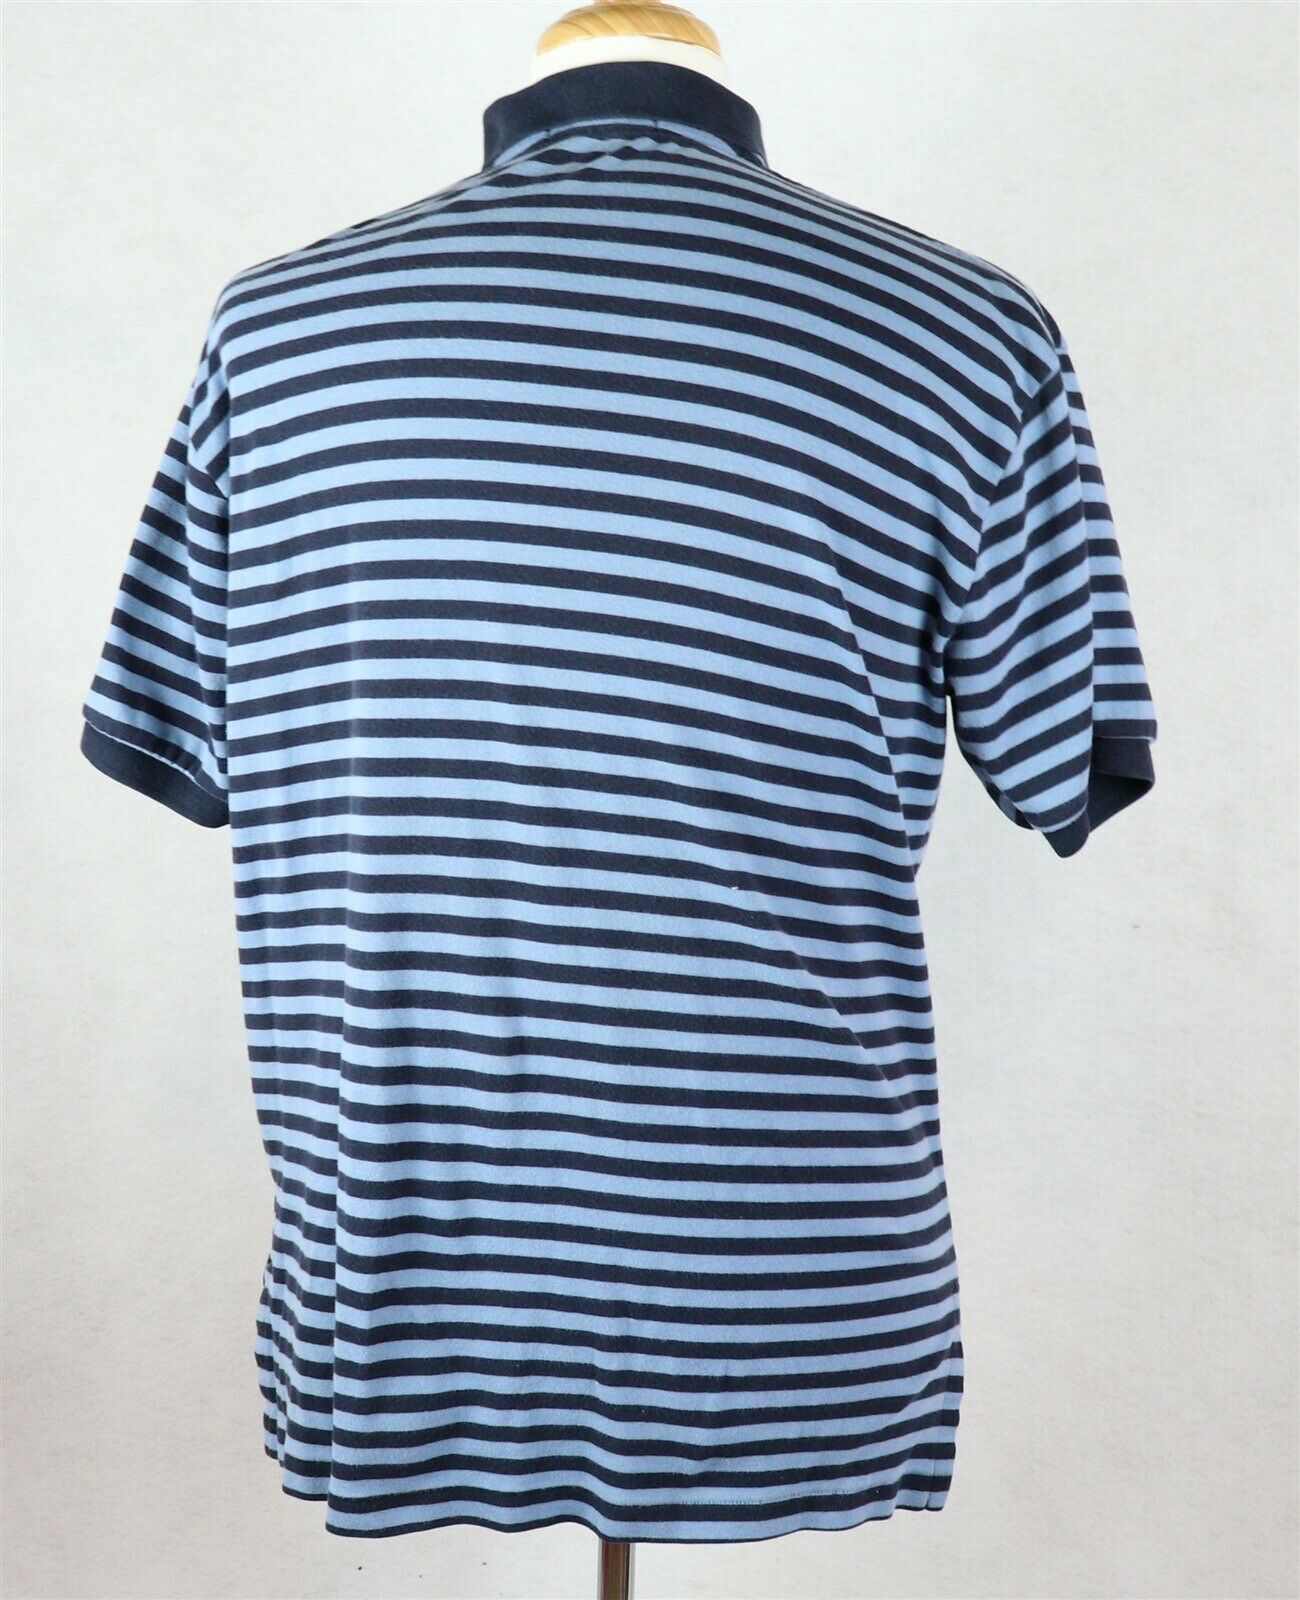 Ralph Lauren Polo Mens Striped Polo Shirt Size Large